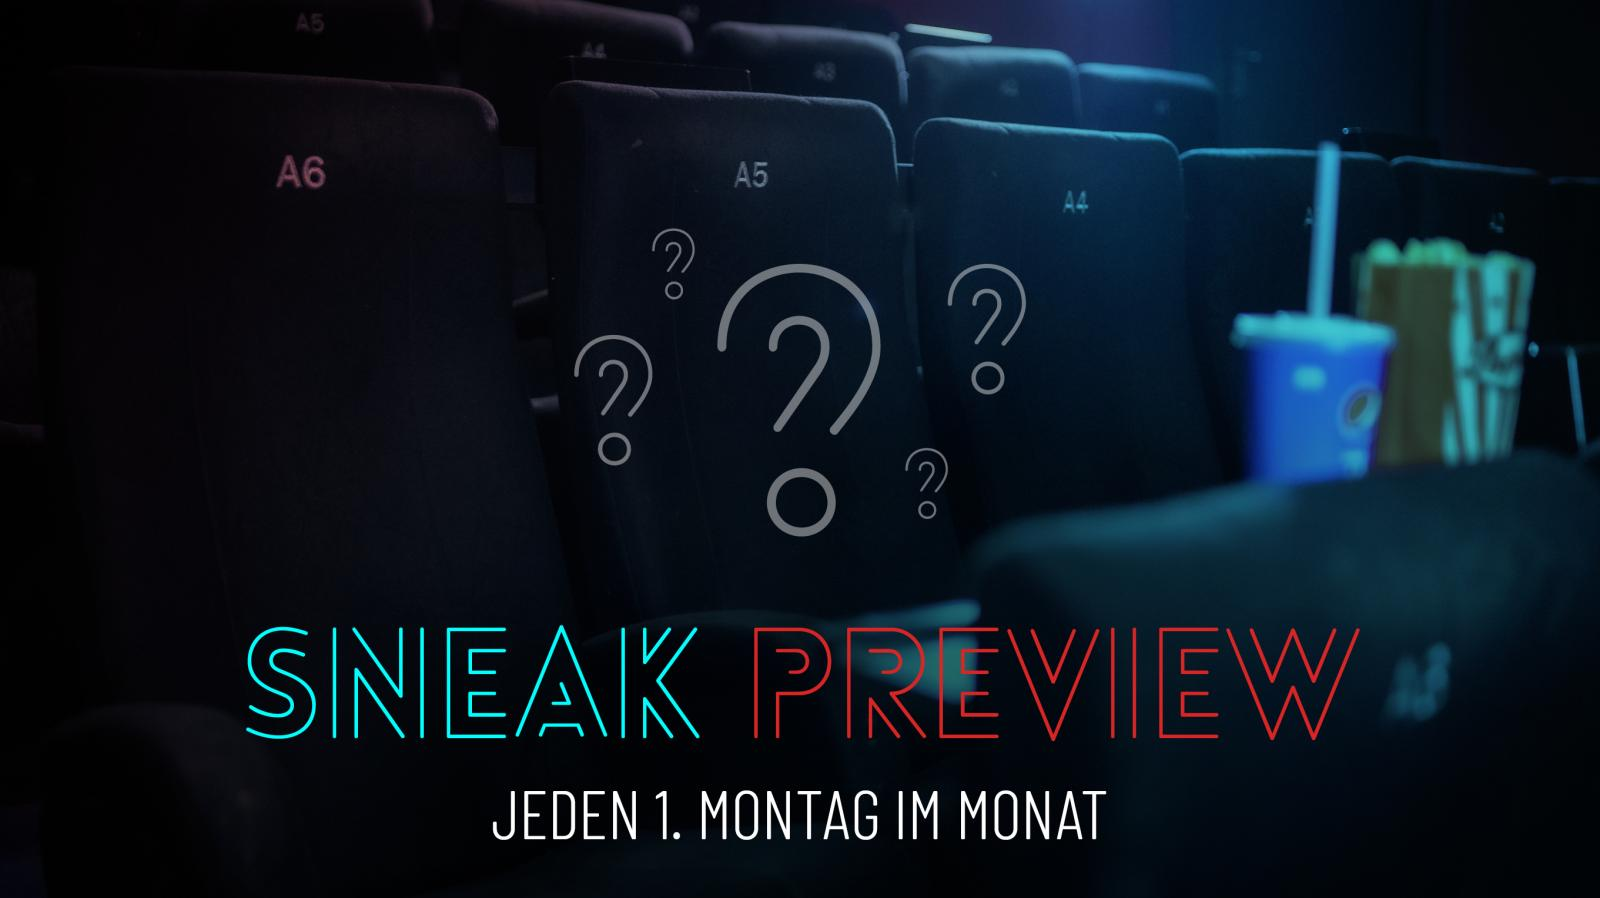 Sneak Preview - Jeden 1. Montag im Monat